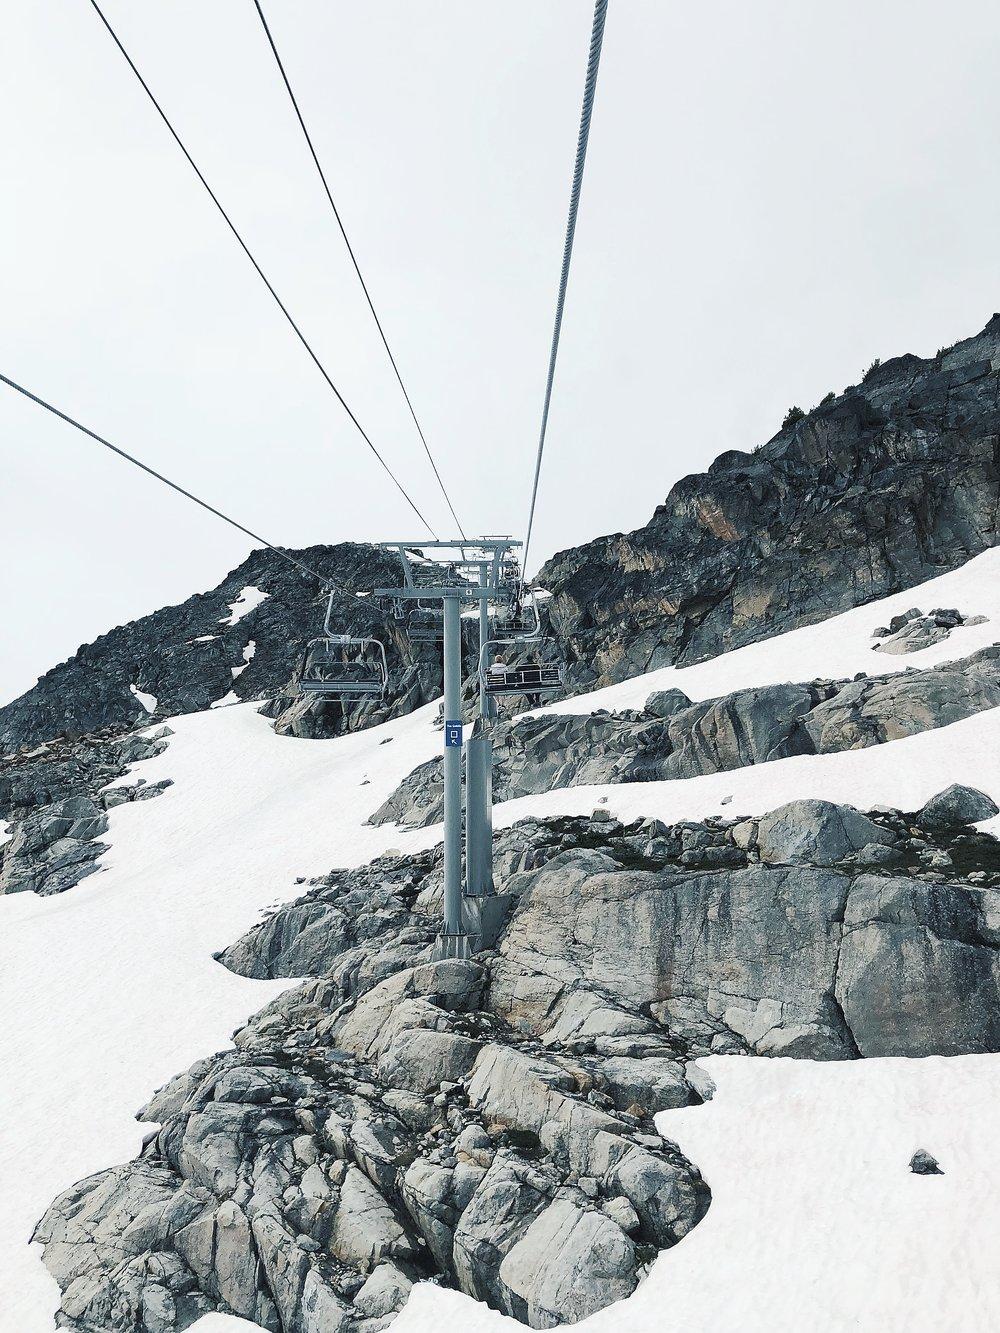 Peak Express chairlift to Whistler Suspension Bridge